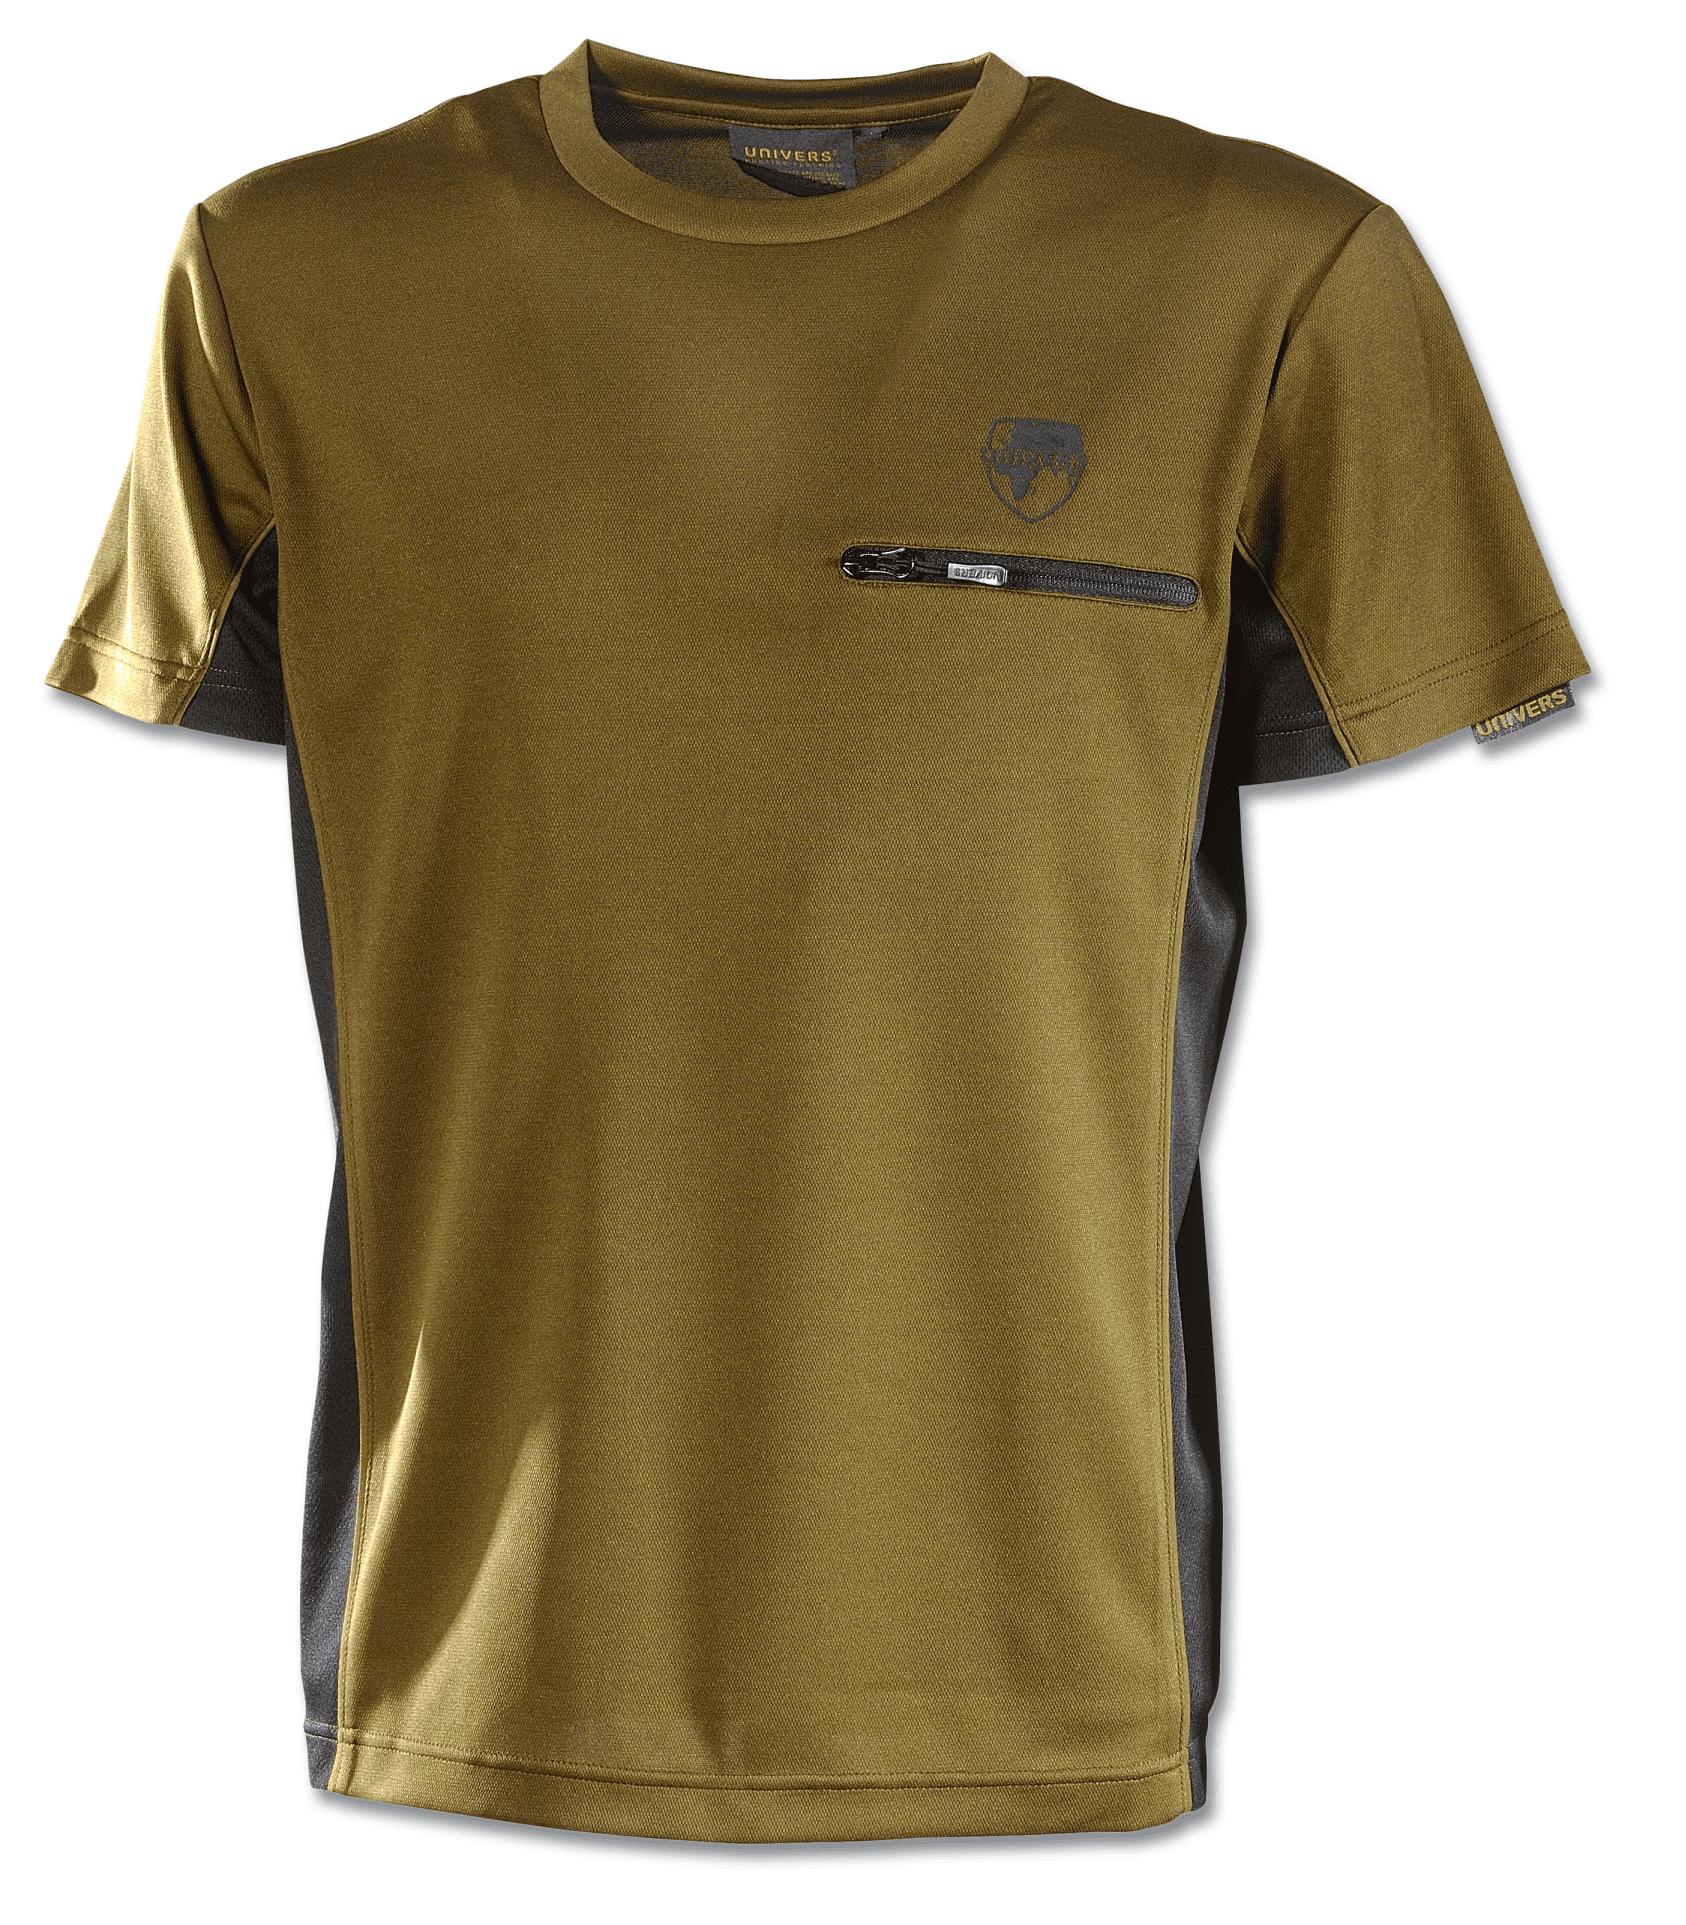 Univers Technical T-shirt 94074 / 302